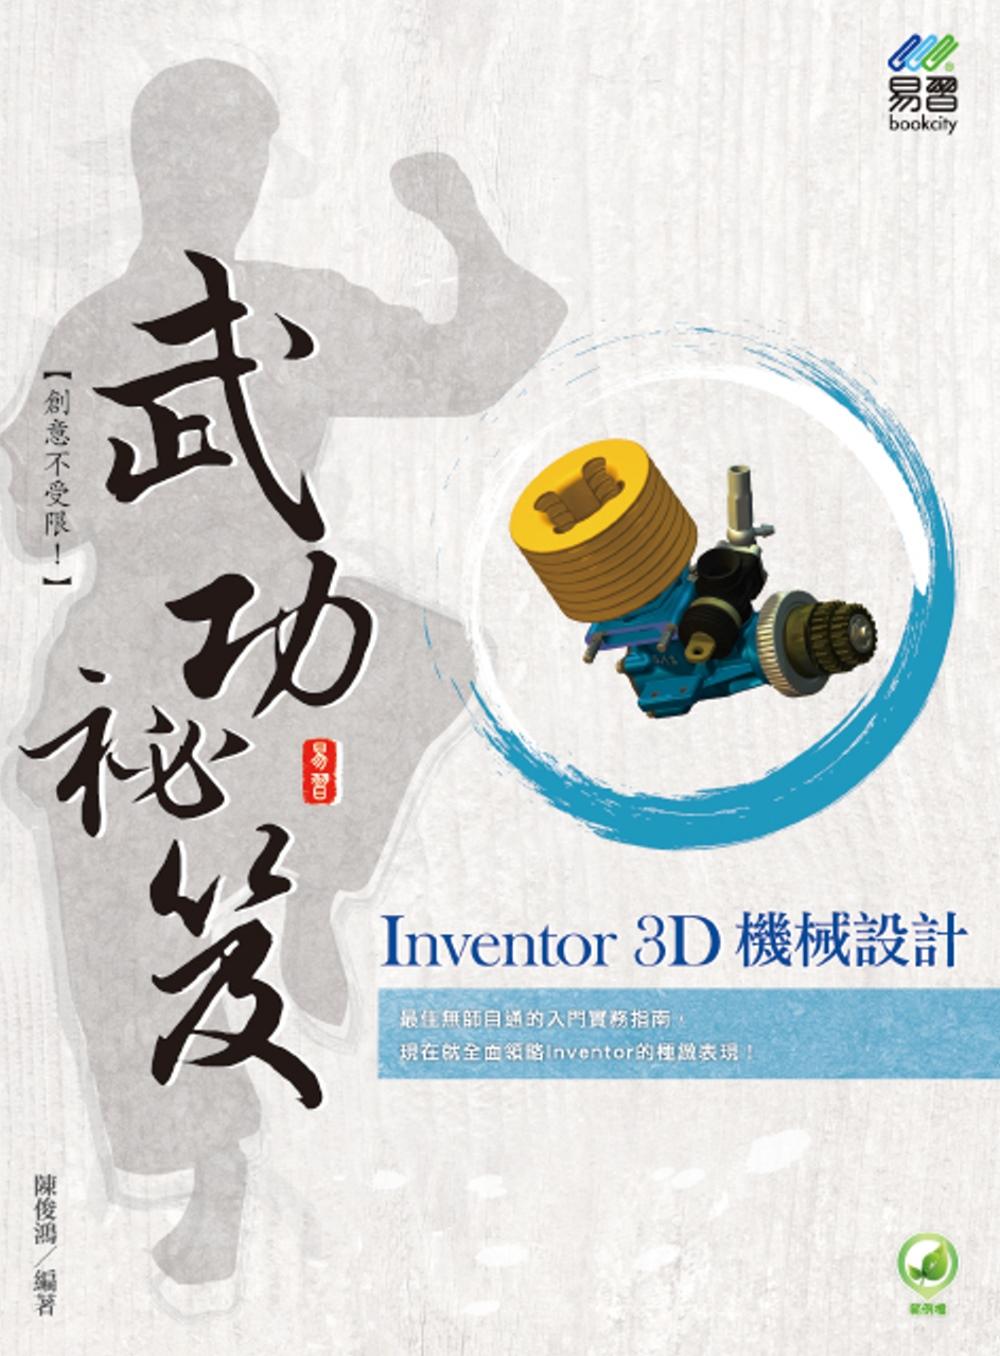 Inventor 3D 機械設計 武功密笈